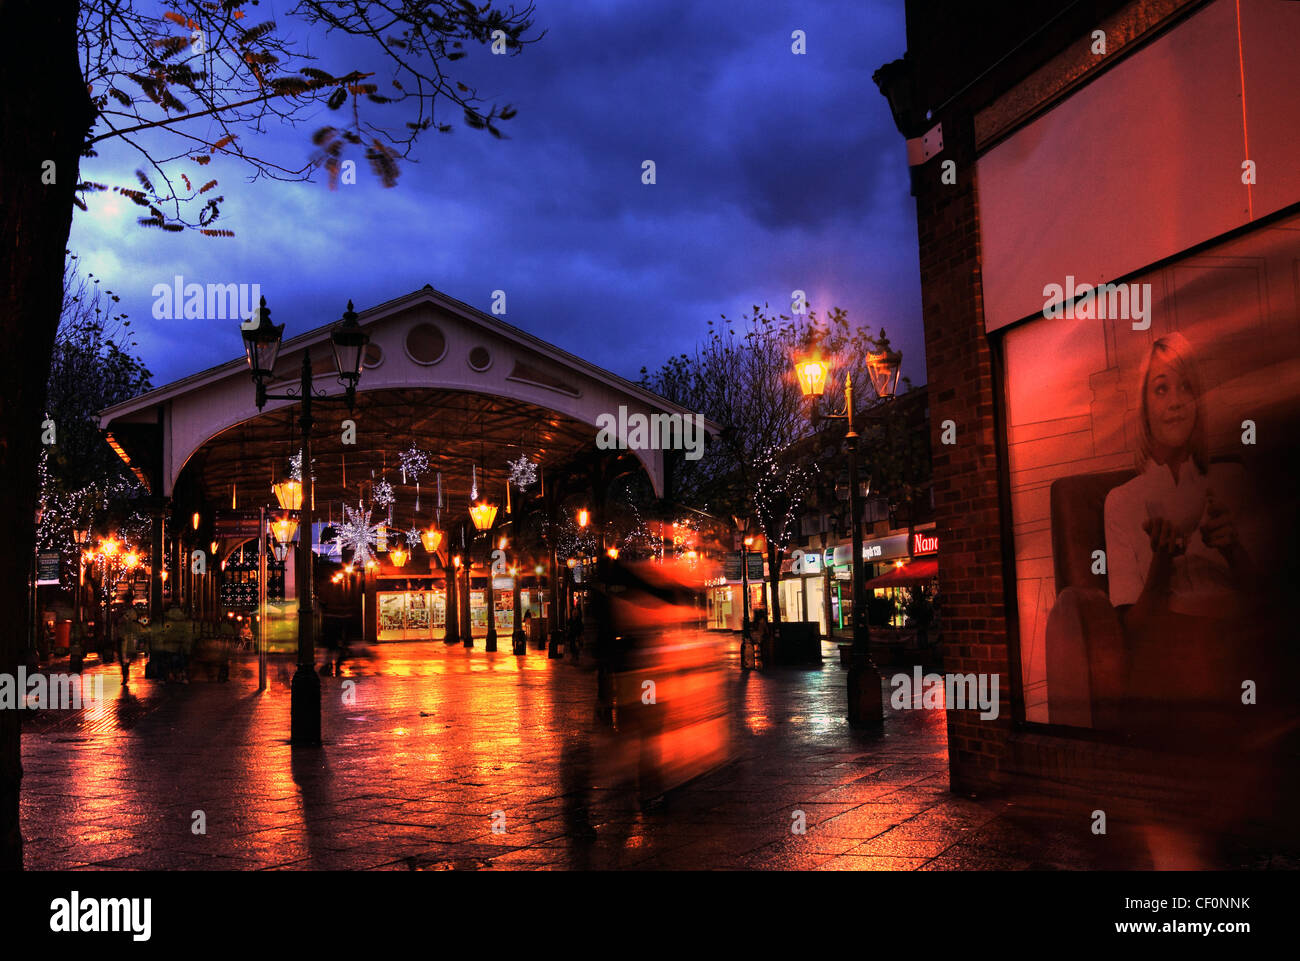 Dusk at Old Fish Market Golden Square Marketplace Warrington,Cheshire,UK,night,gotonysmith,blue,hour,bluehour,movement,blur,winter,market,place,Warringtonian,gotonysmith,Buy Pictures of,Buy Images Of